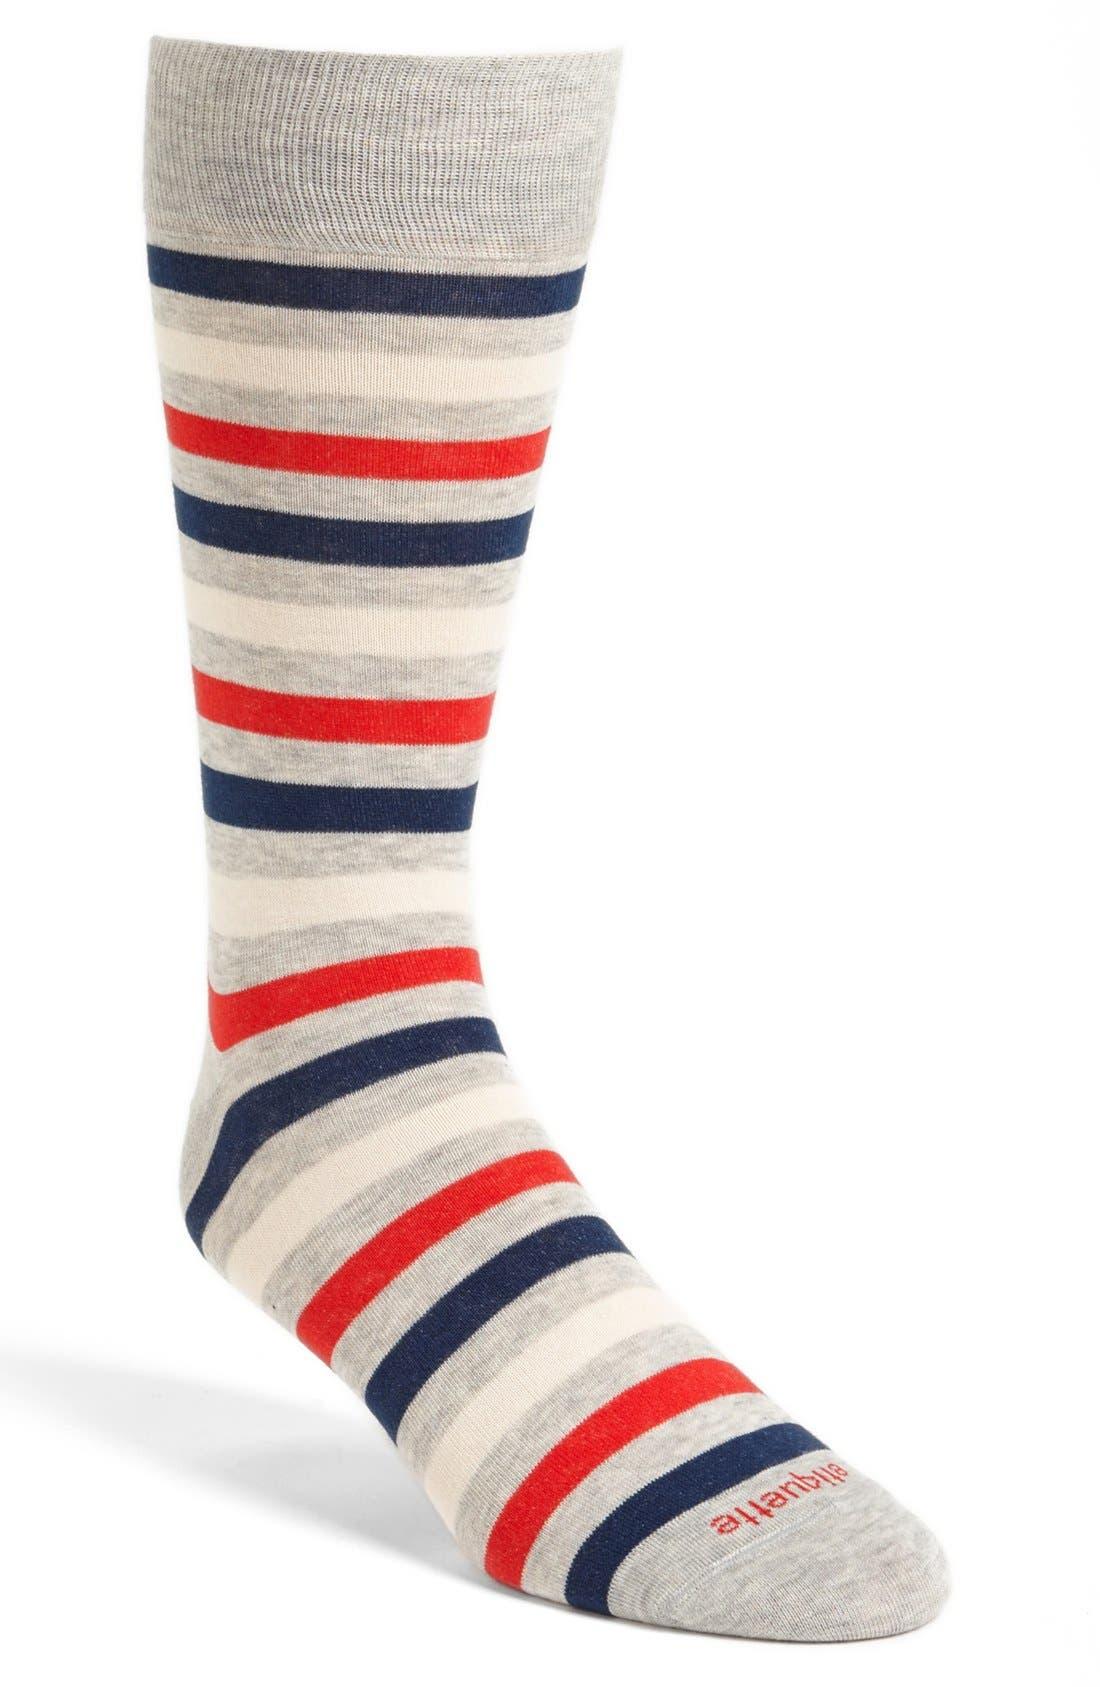 Main Image - Etiquette Clothiers 'Crosswalk' Socks